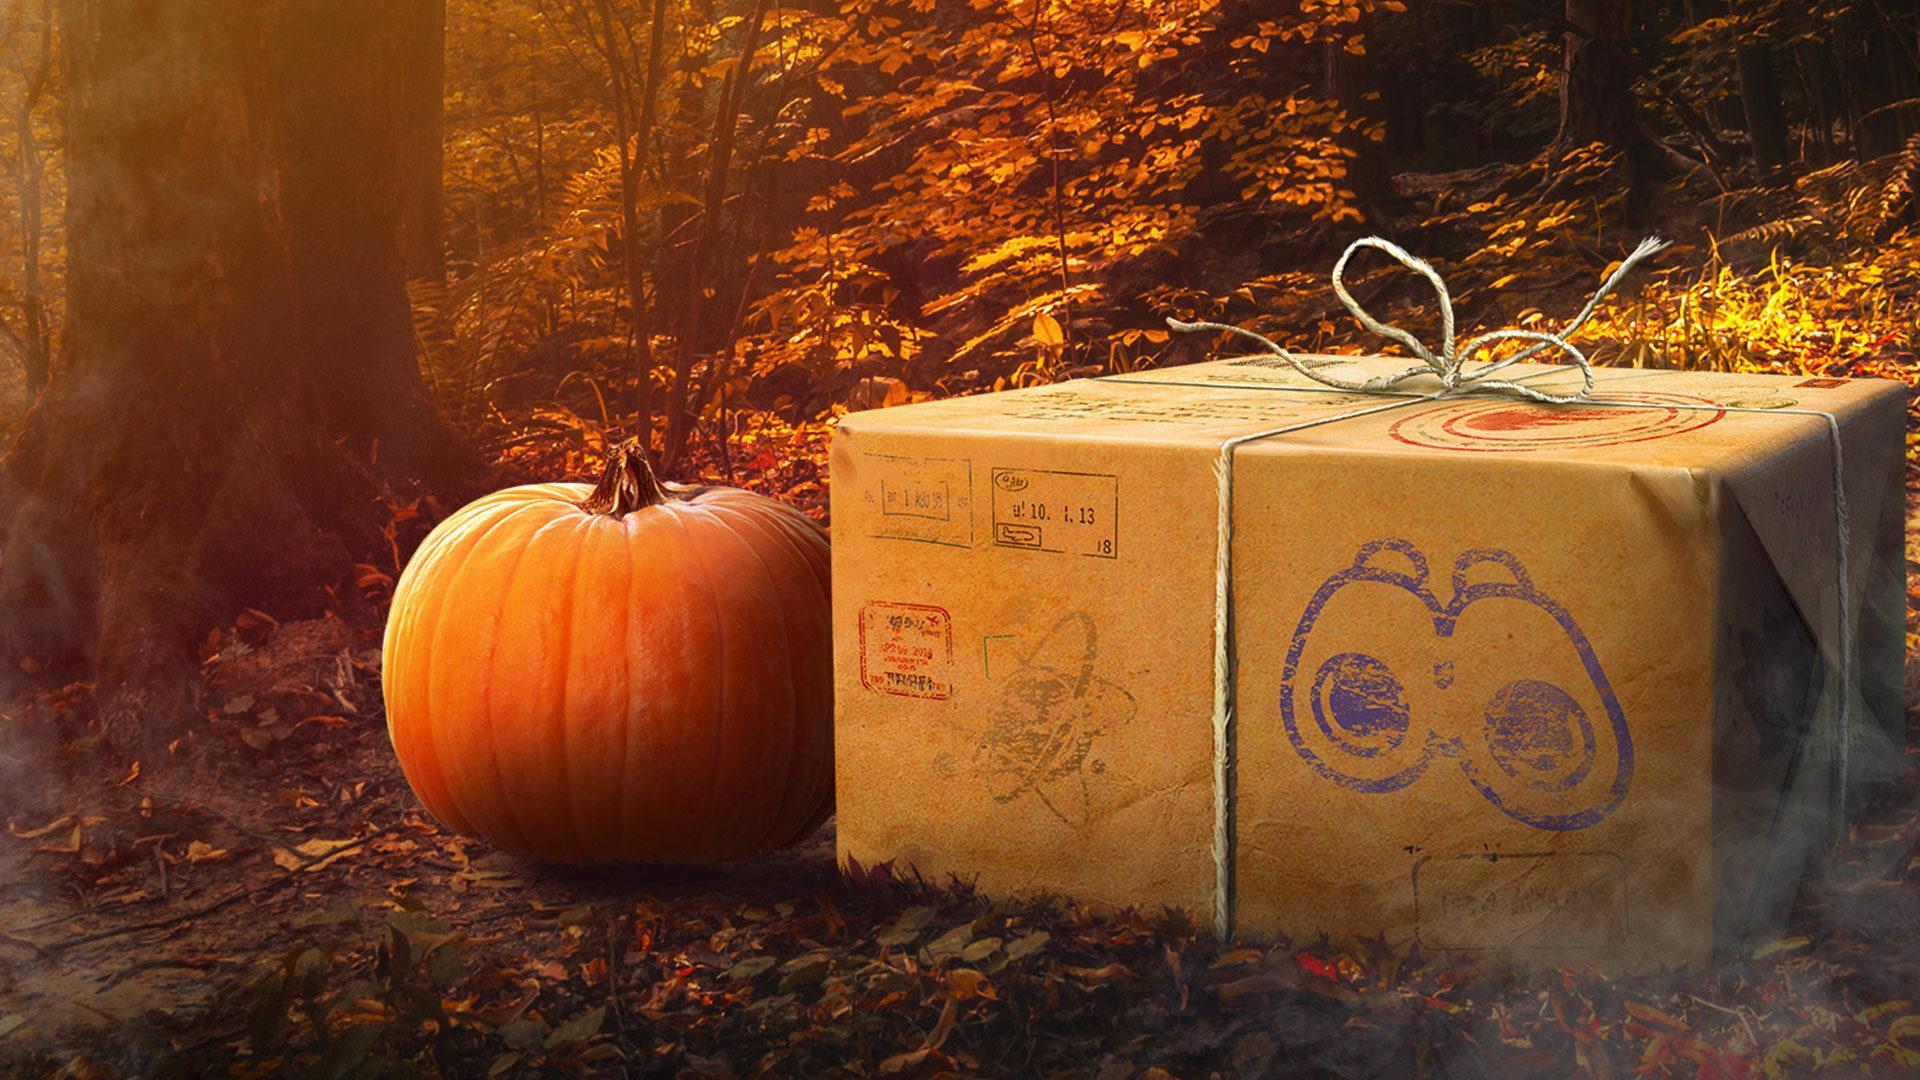 Programme du mois d'Octobre – Pokémon GO Halloween 2021 et Zarude sont là!